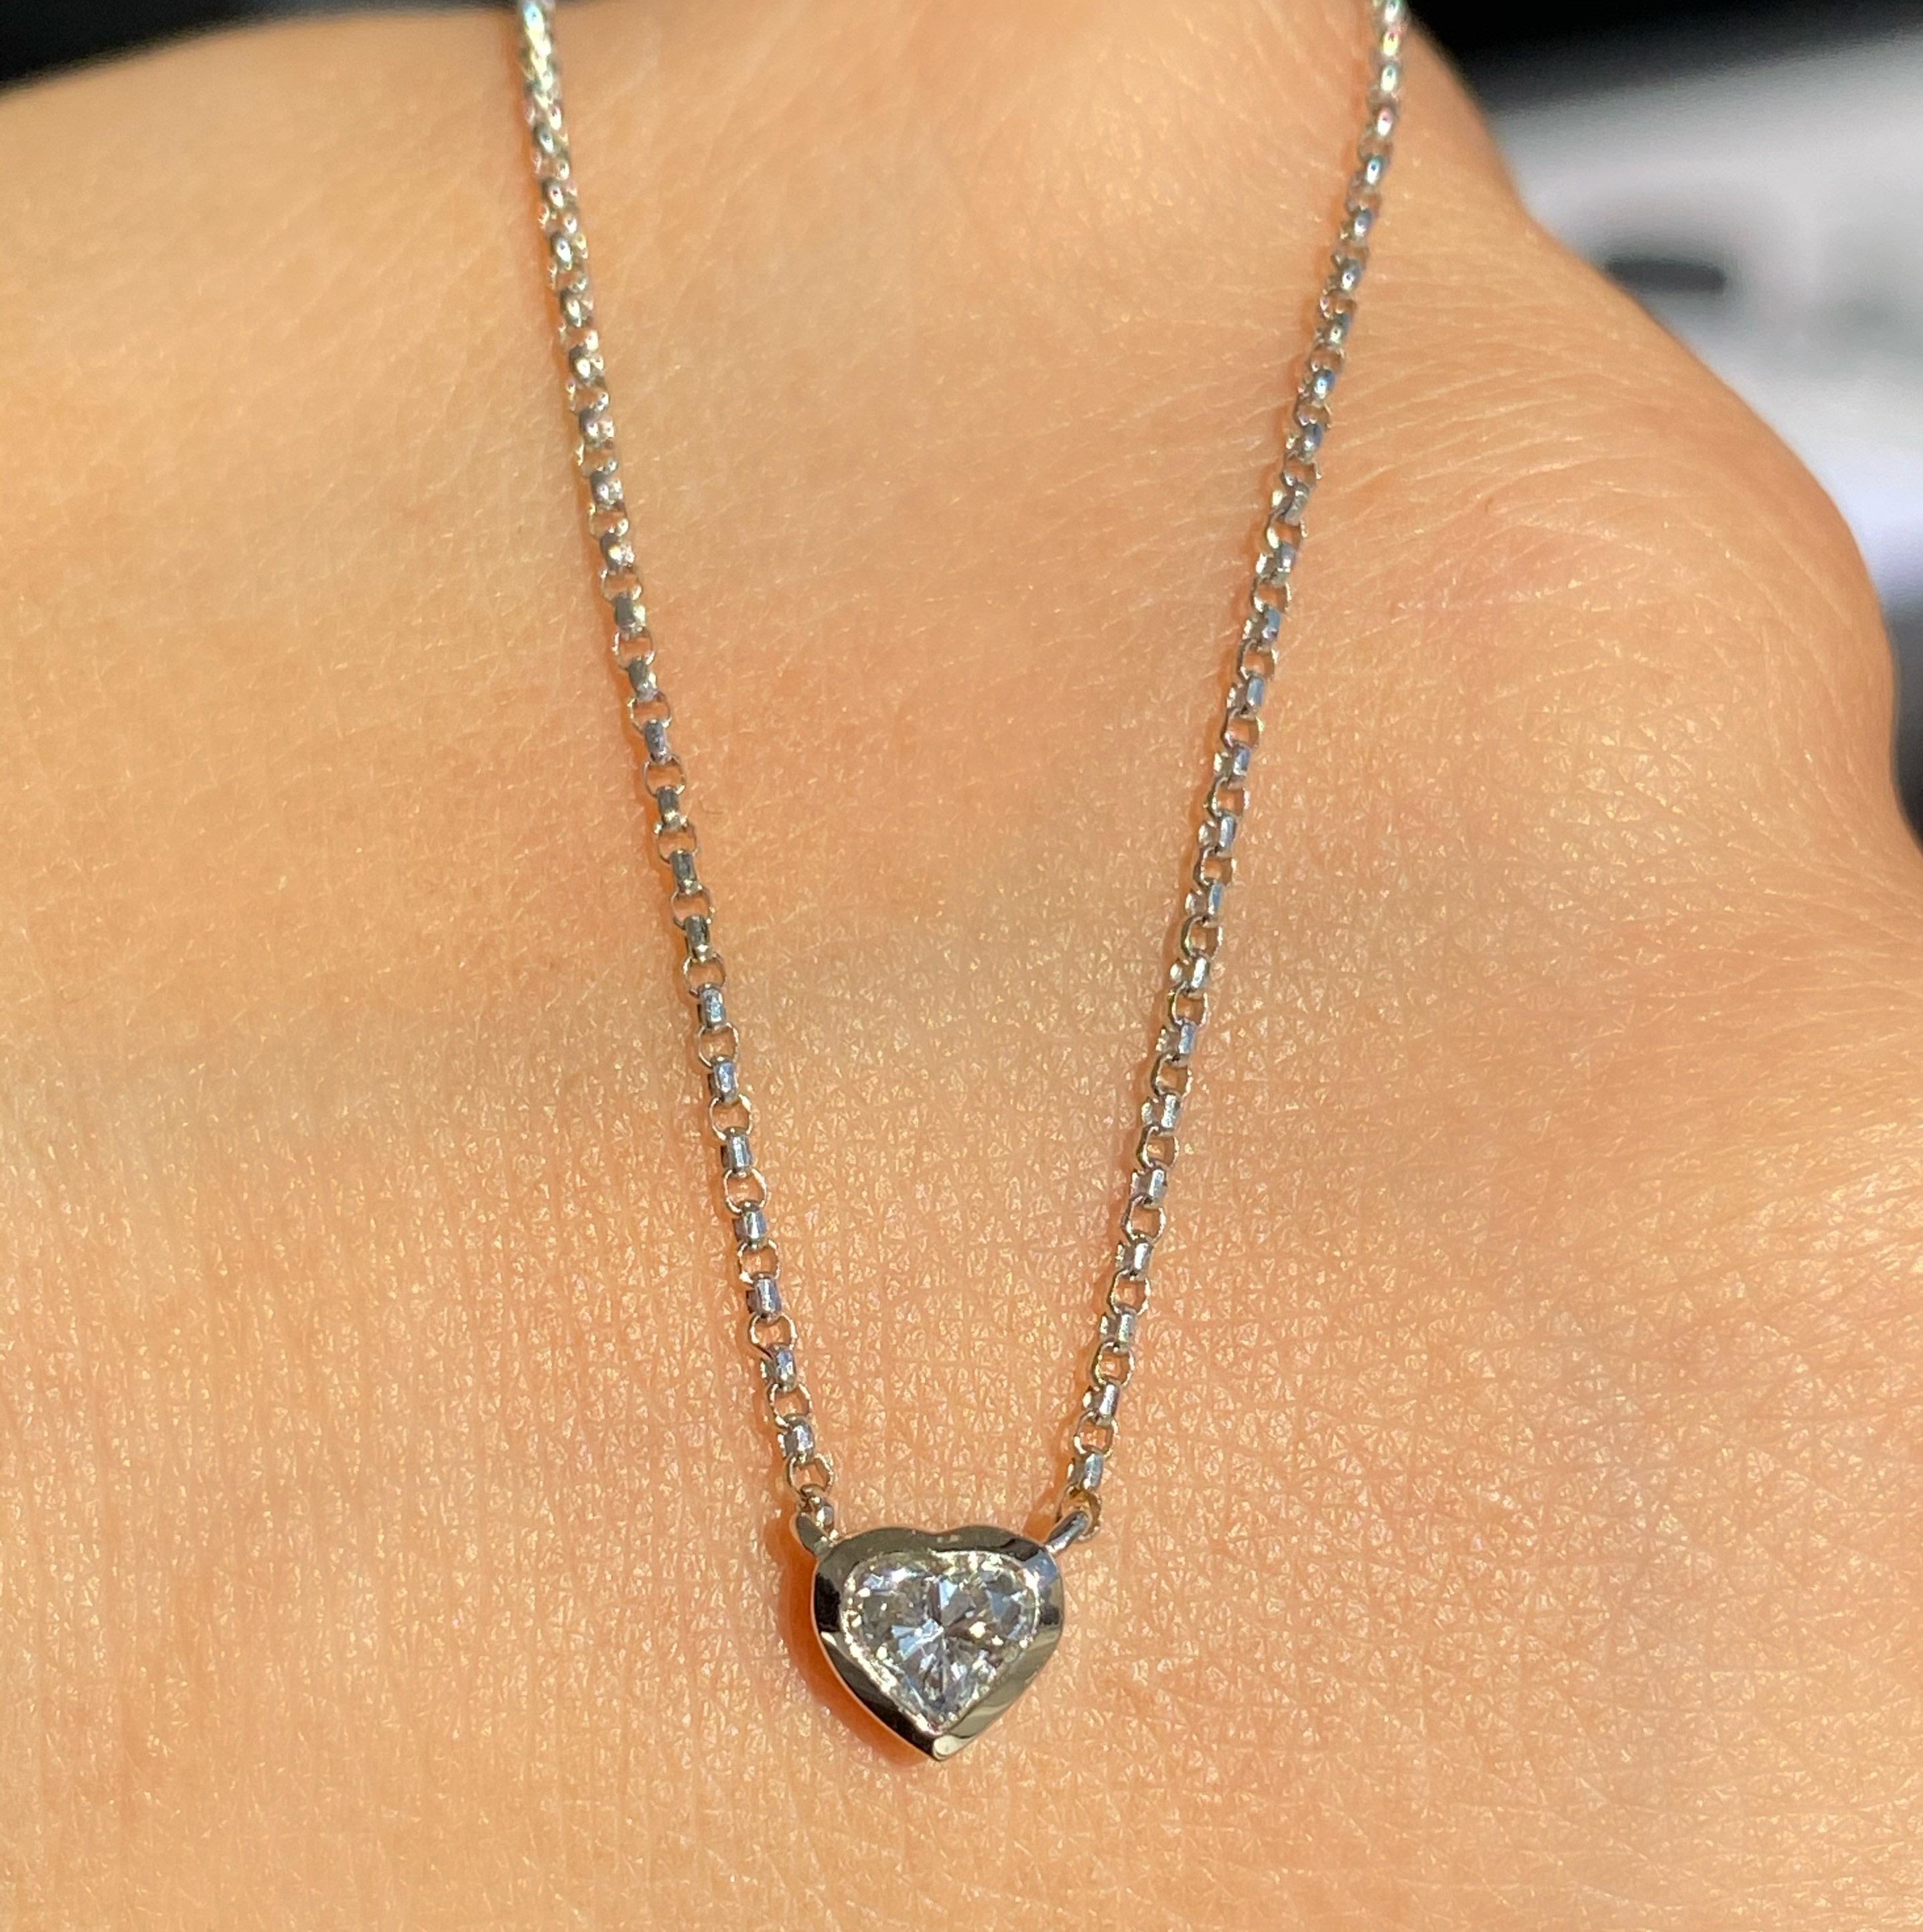 Heart shape Diamond Necklace -  Image